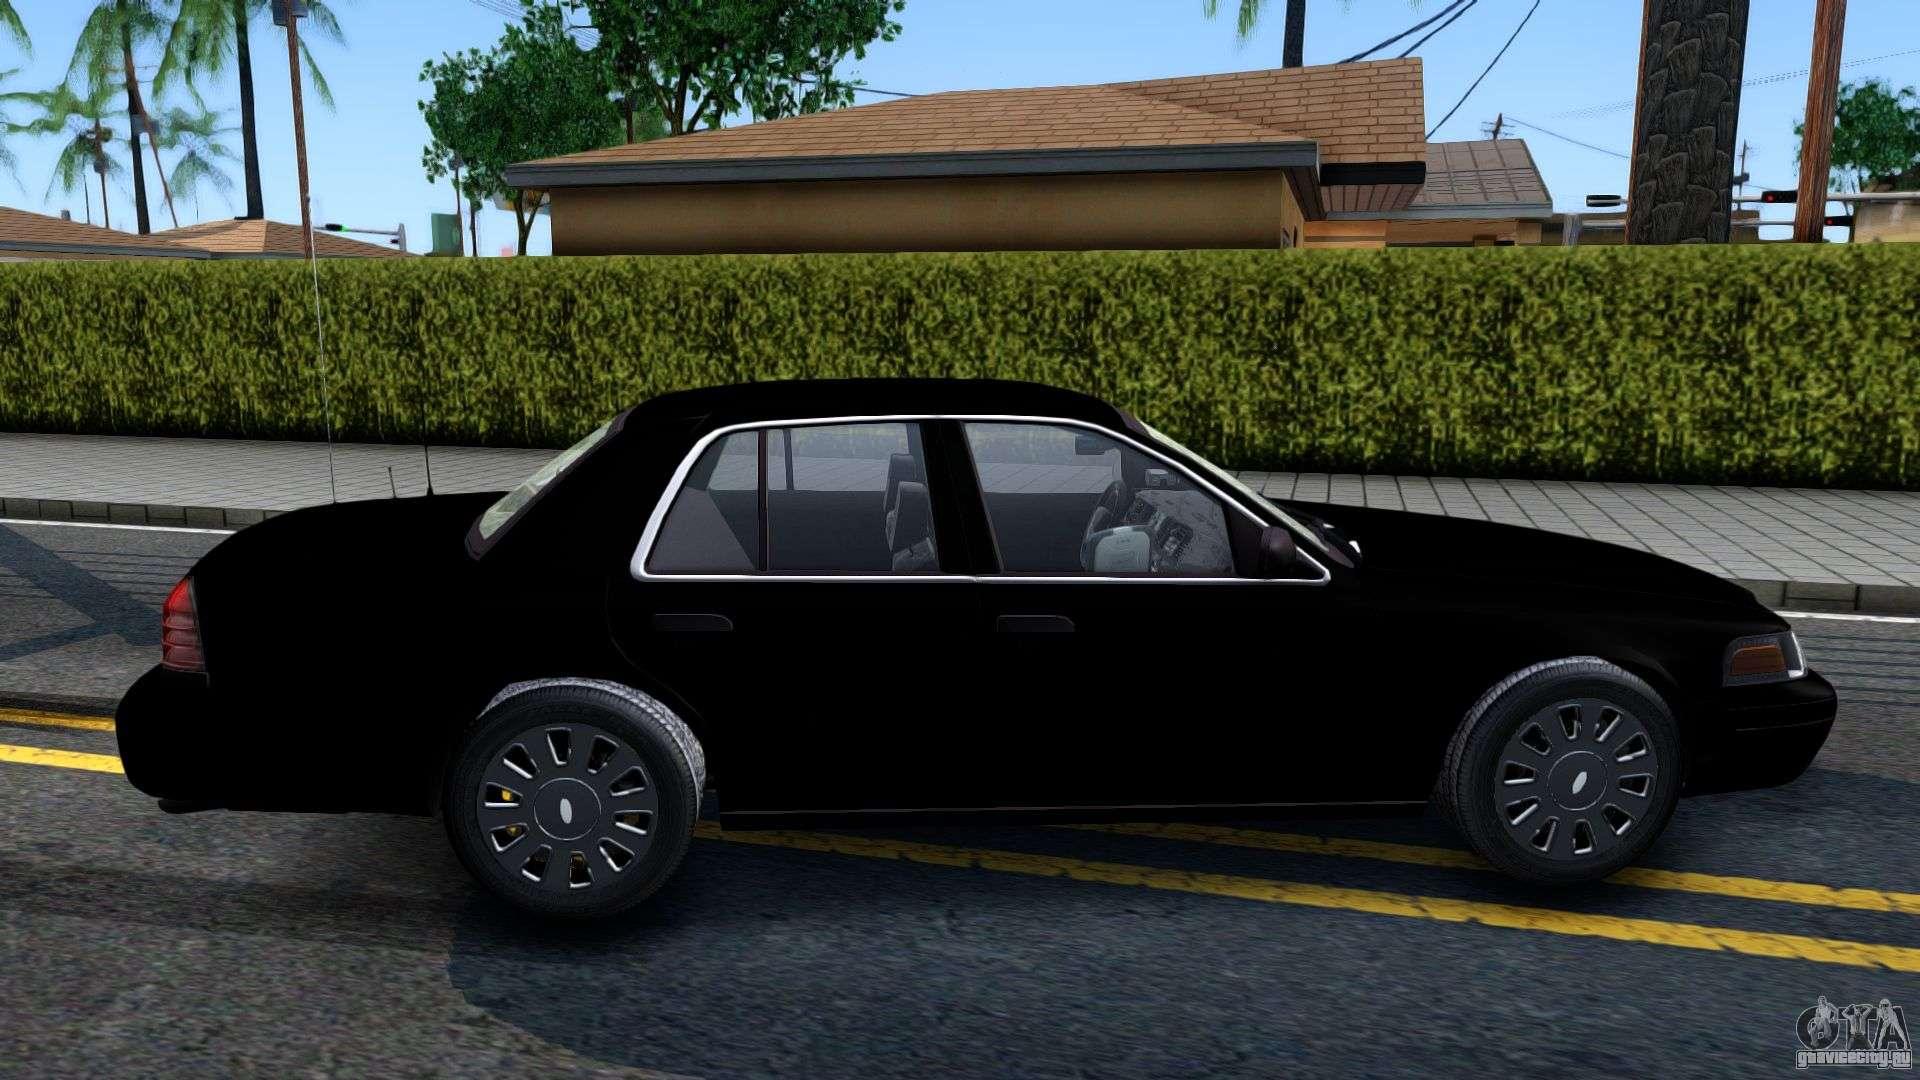 Ford Crown Victoria Ohsp Unmarked   D B D Bb D F Gta San Andreas  D B D B D B  D  D B D B D B D B  D  D Bb D B D B D B